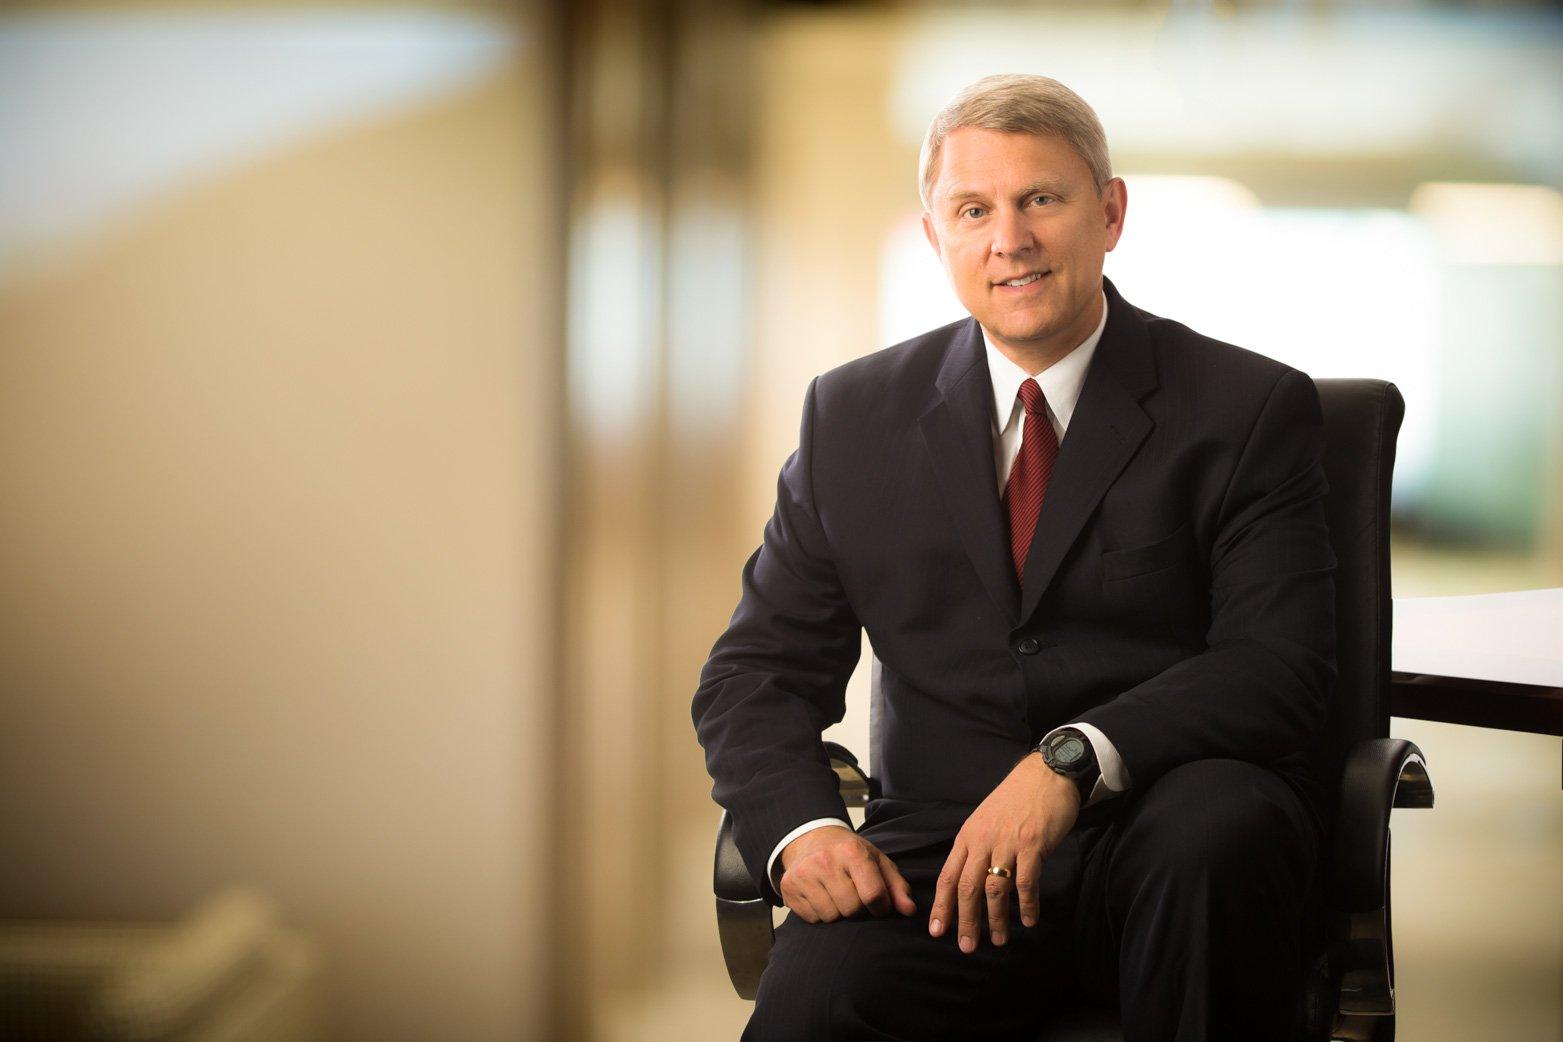 David B. Dellenbach